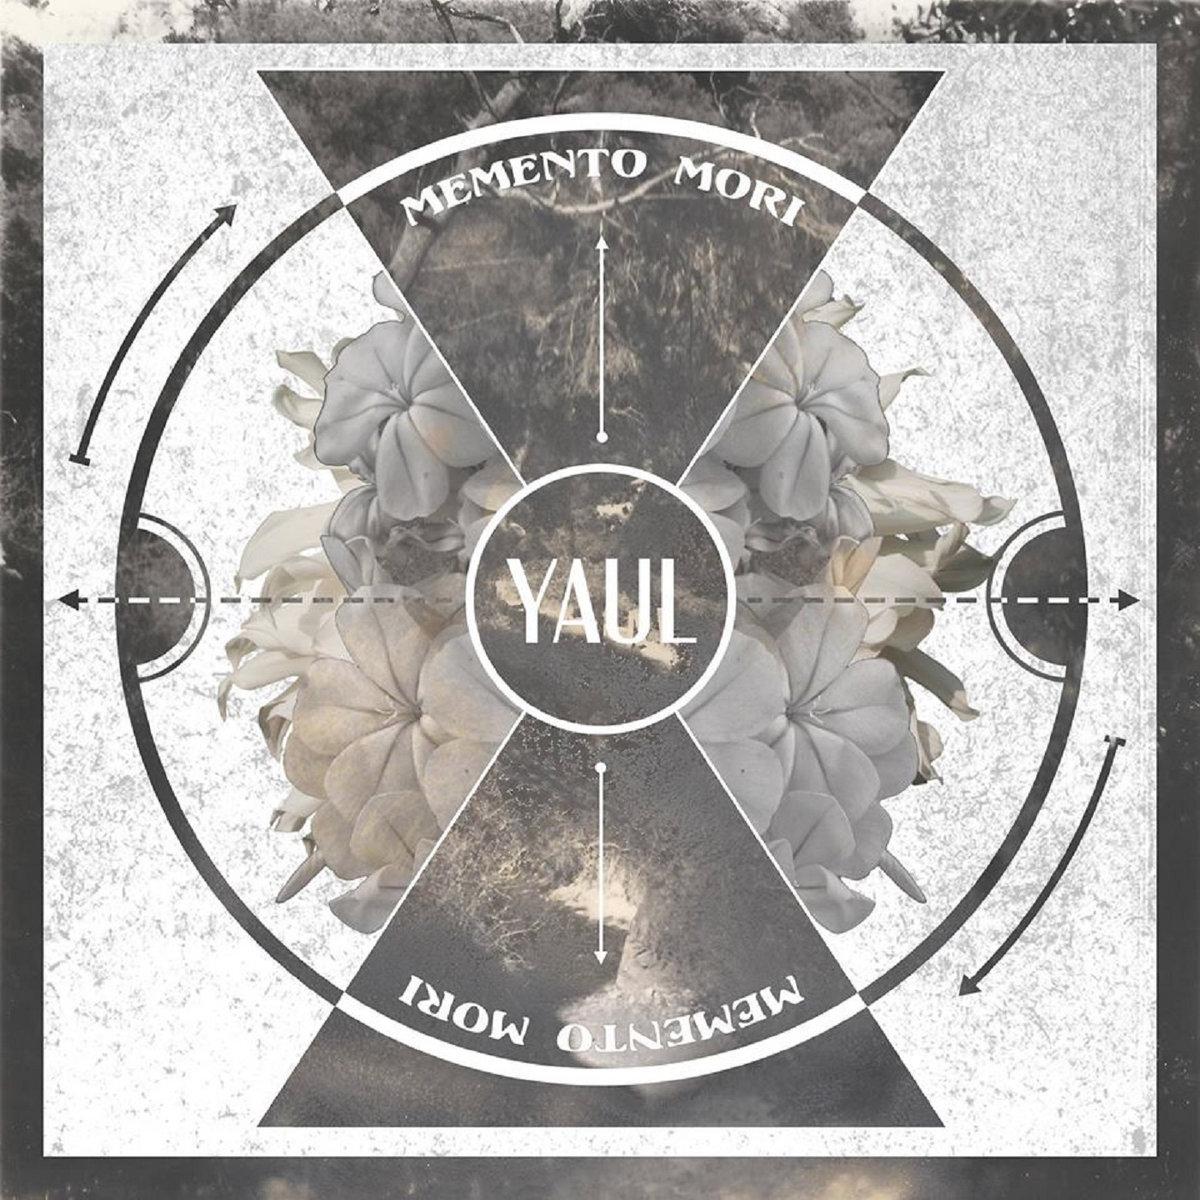 Yaul - Memento Mori (2017)